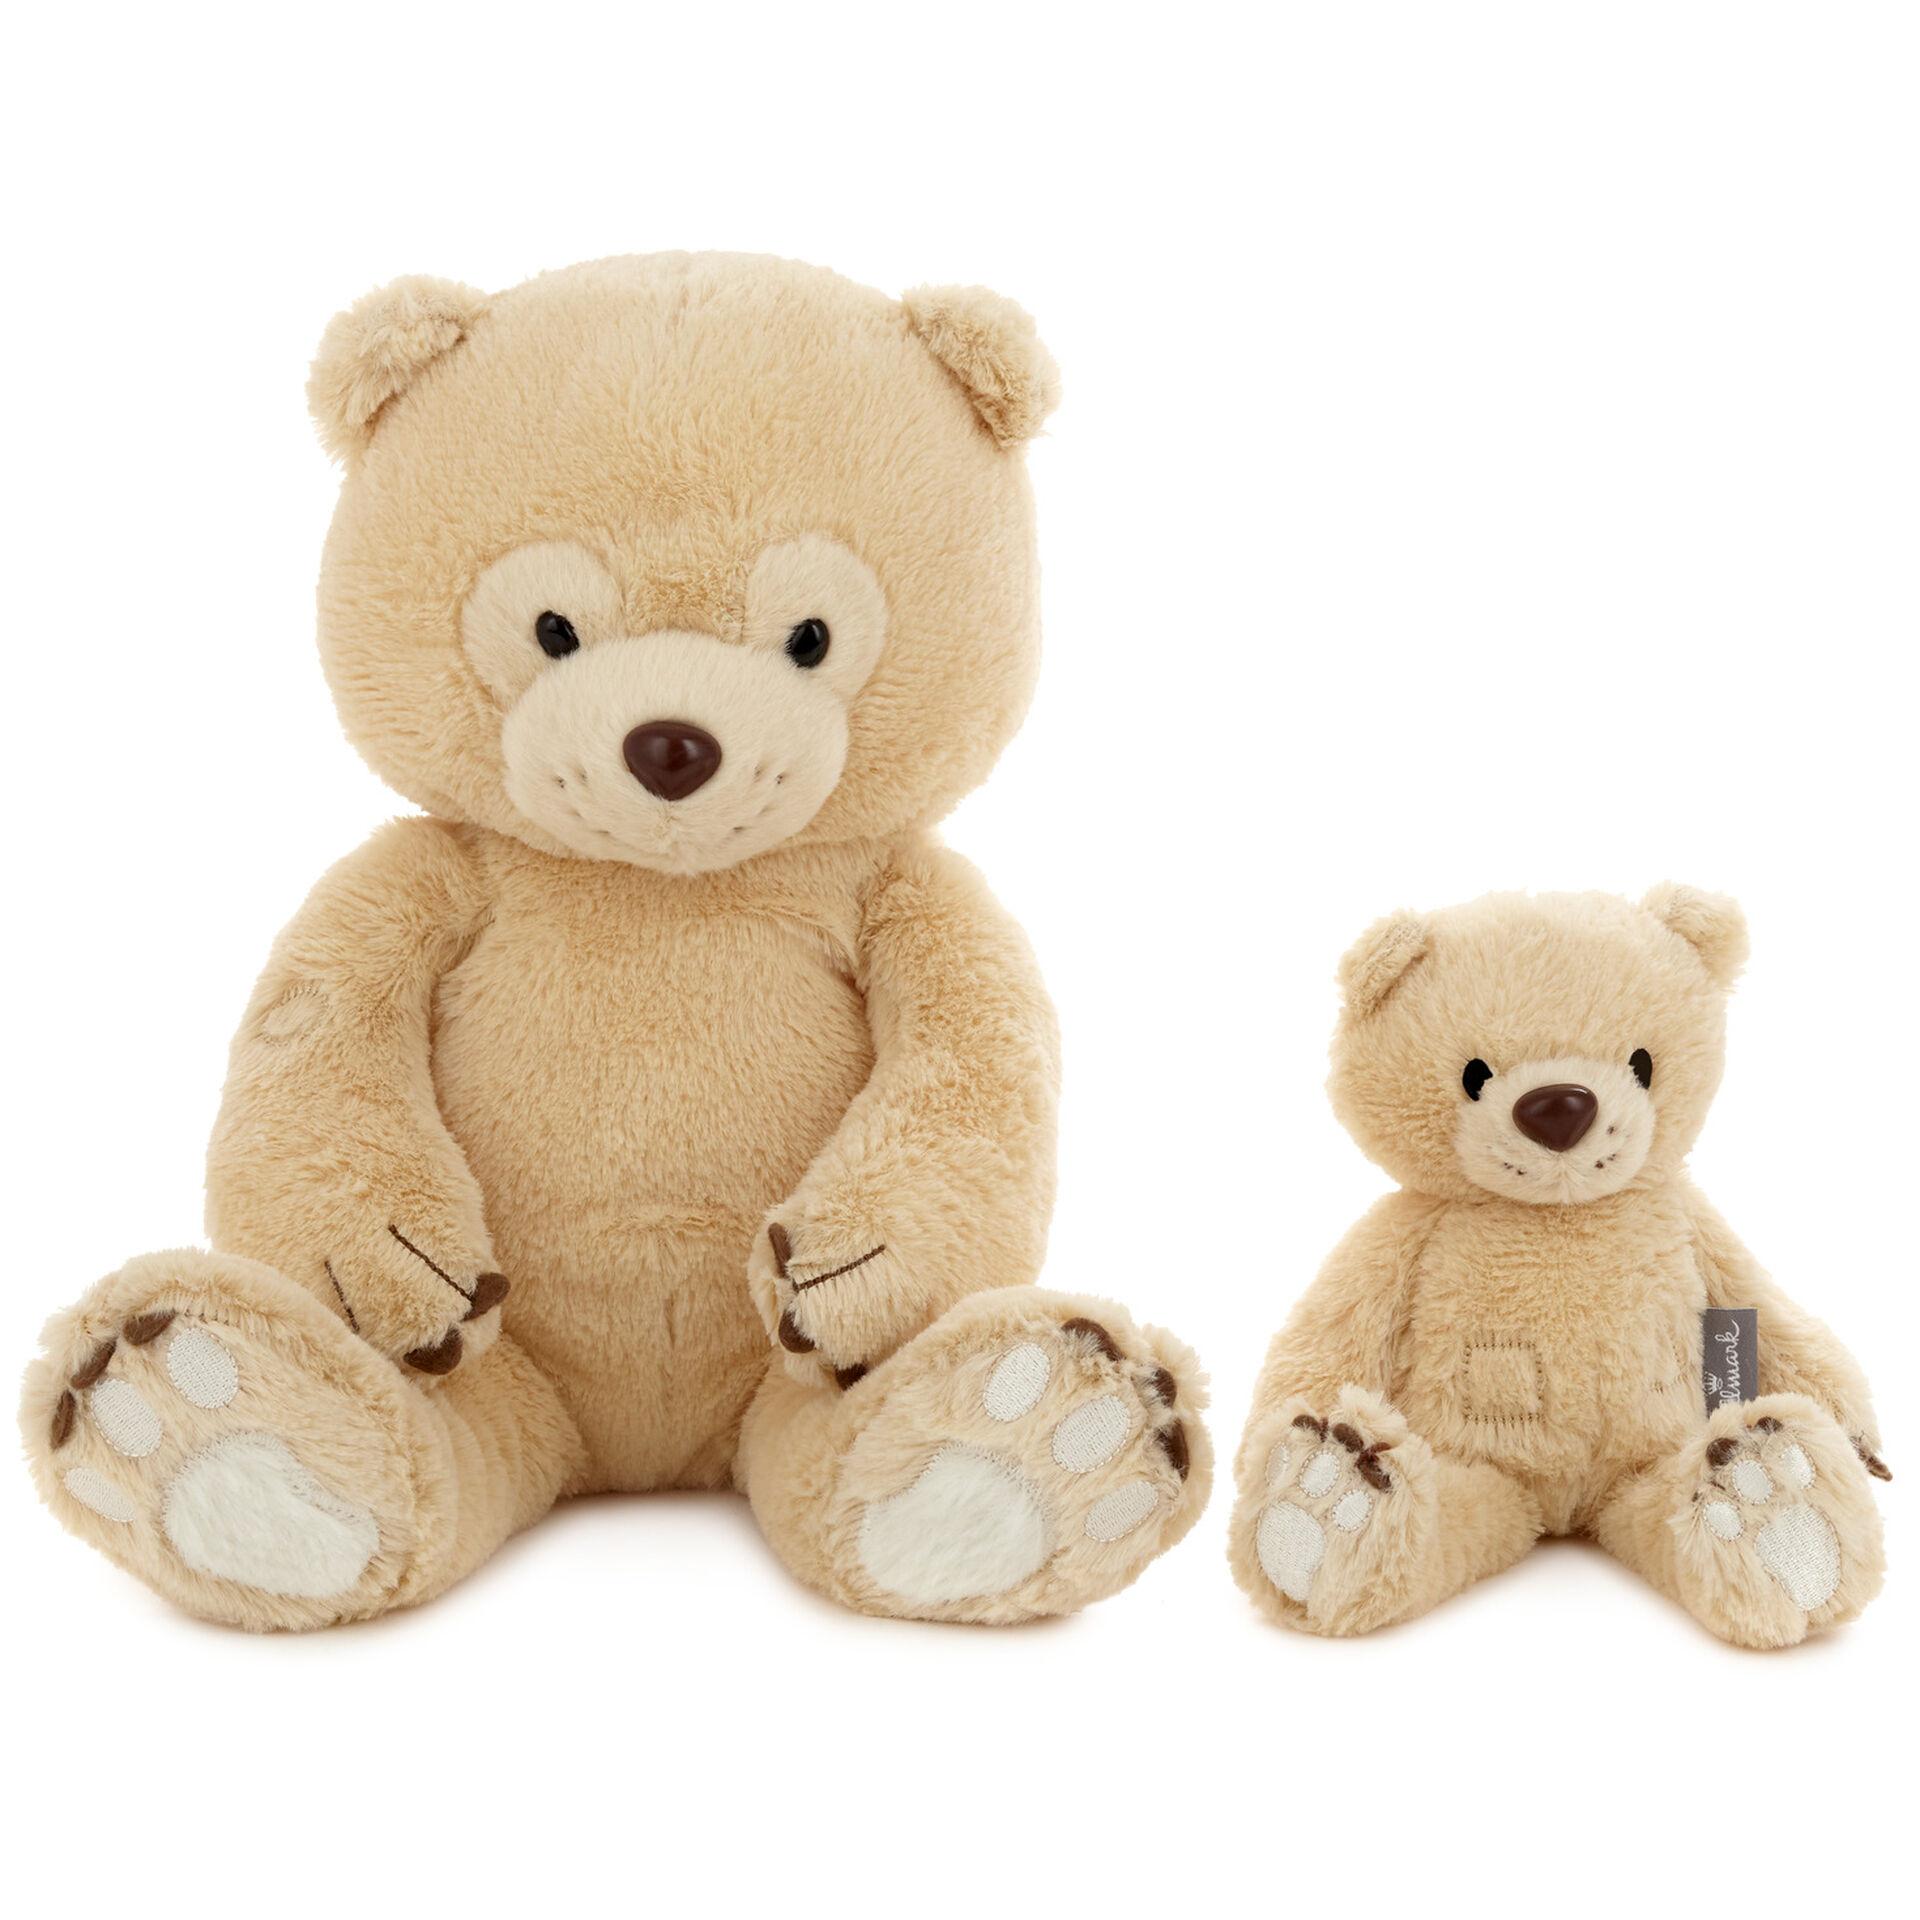 Big Bear And Little Bear Stuffed Animals 10 Classic Stuffed Animals Hallmark